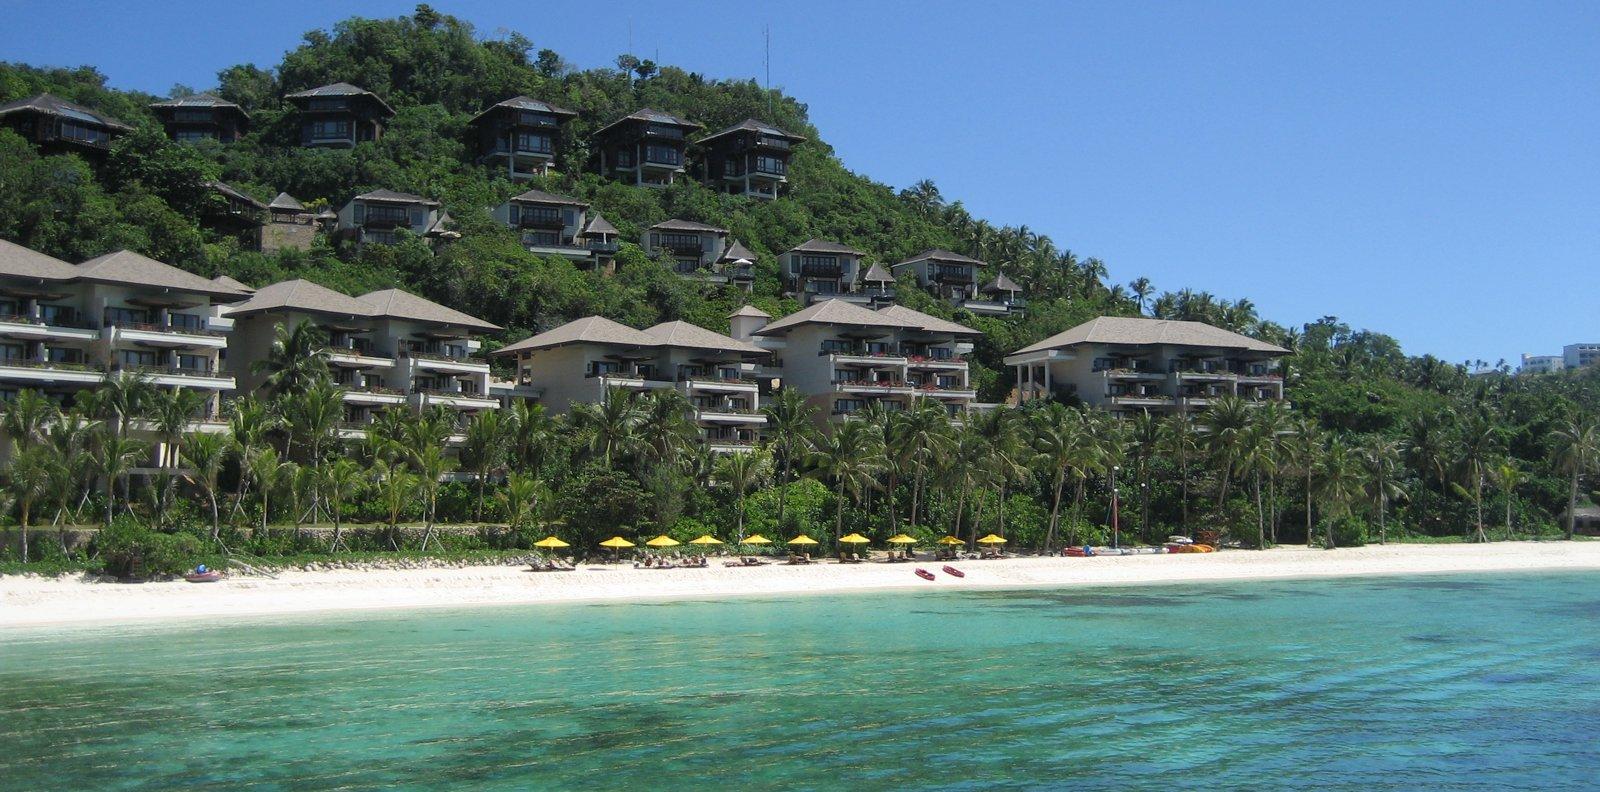 Shangri La Boracay Philippines Deluxe Escapesdeluxe Escapes